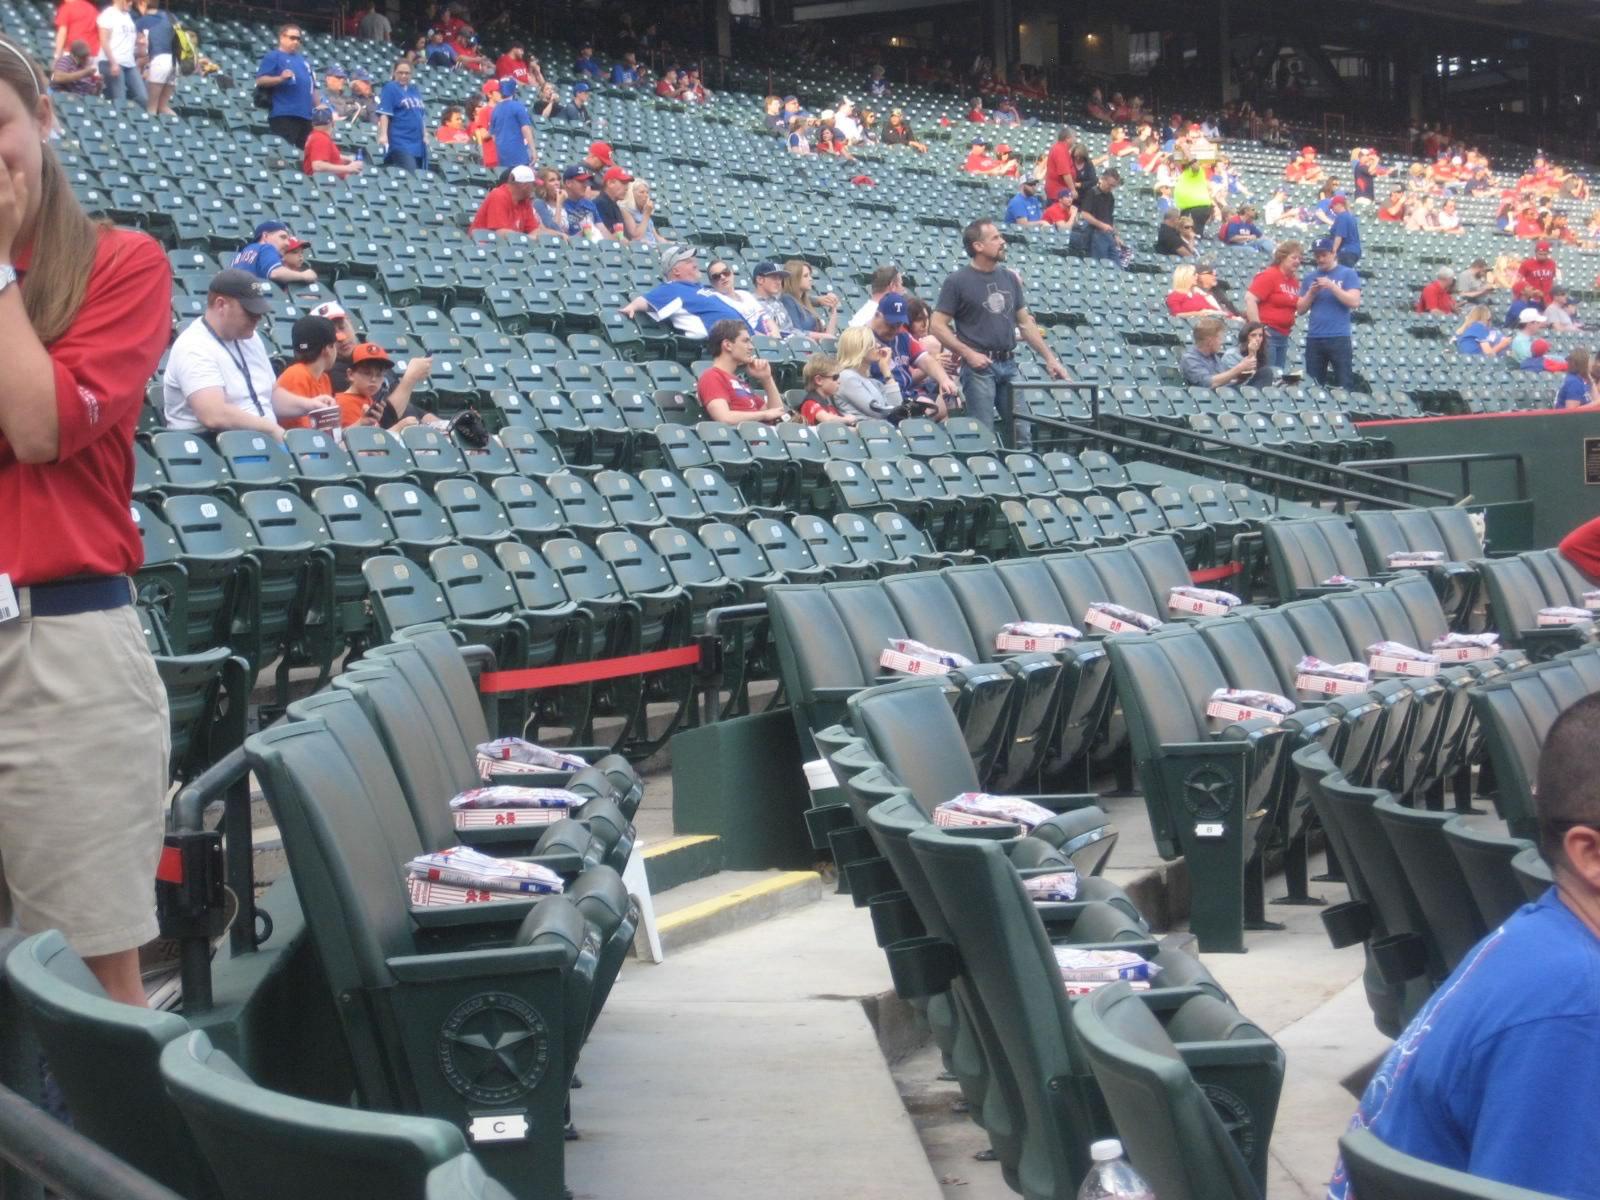 Texas Rangers Club Seating At Globe Life Park